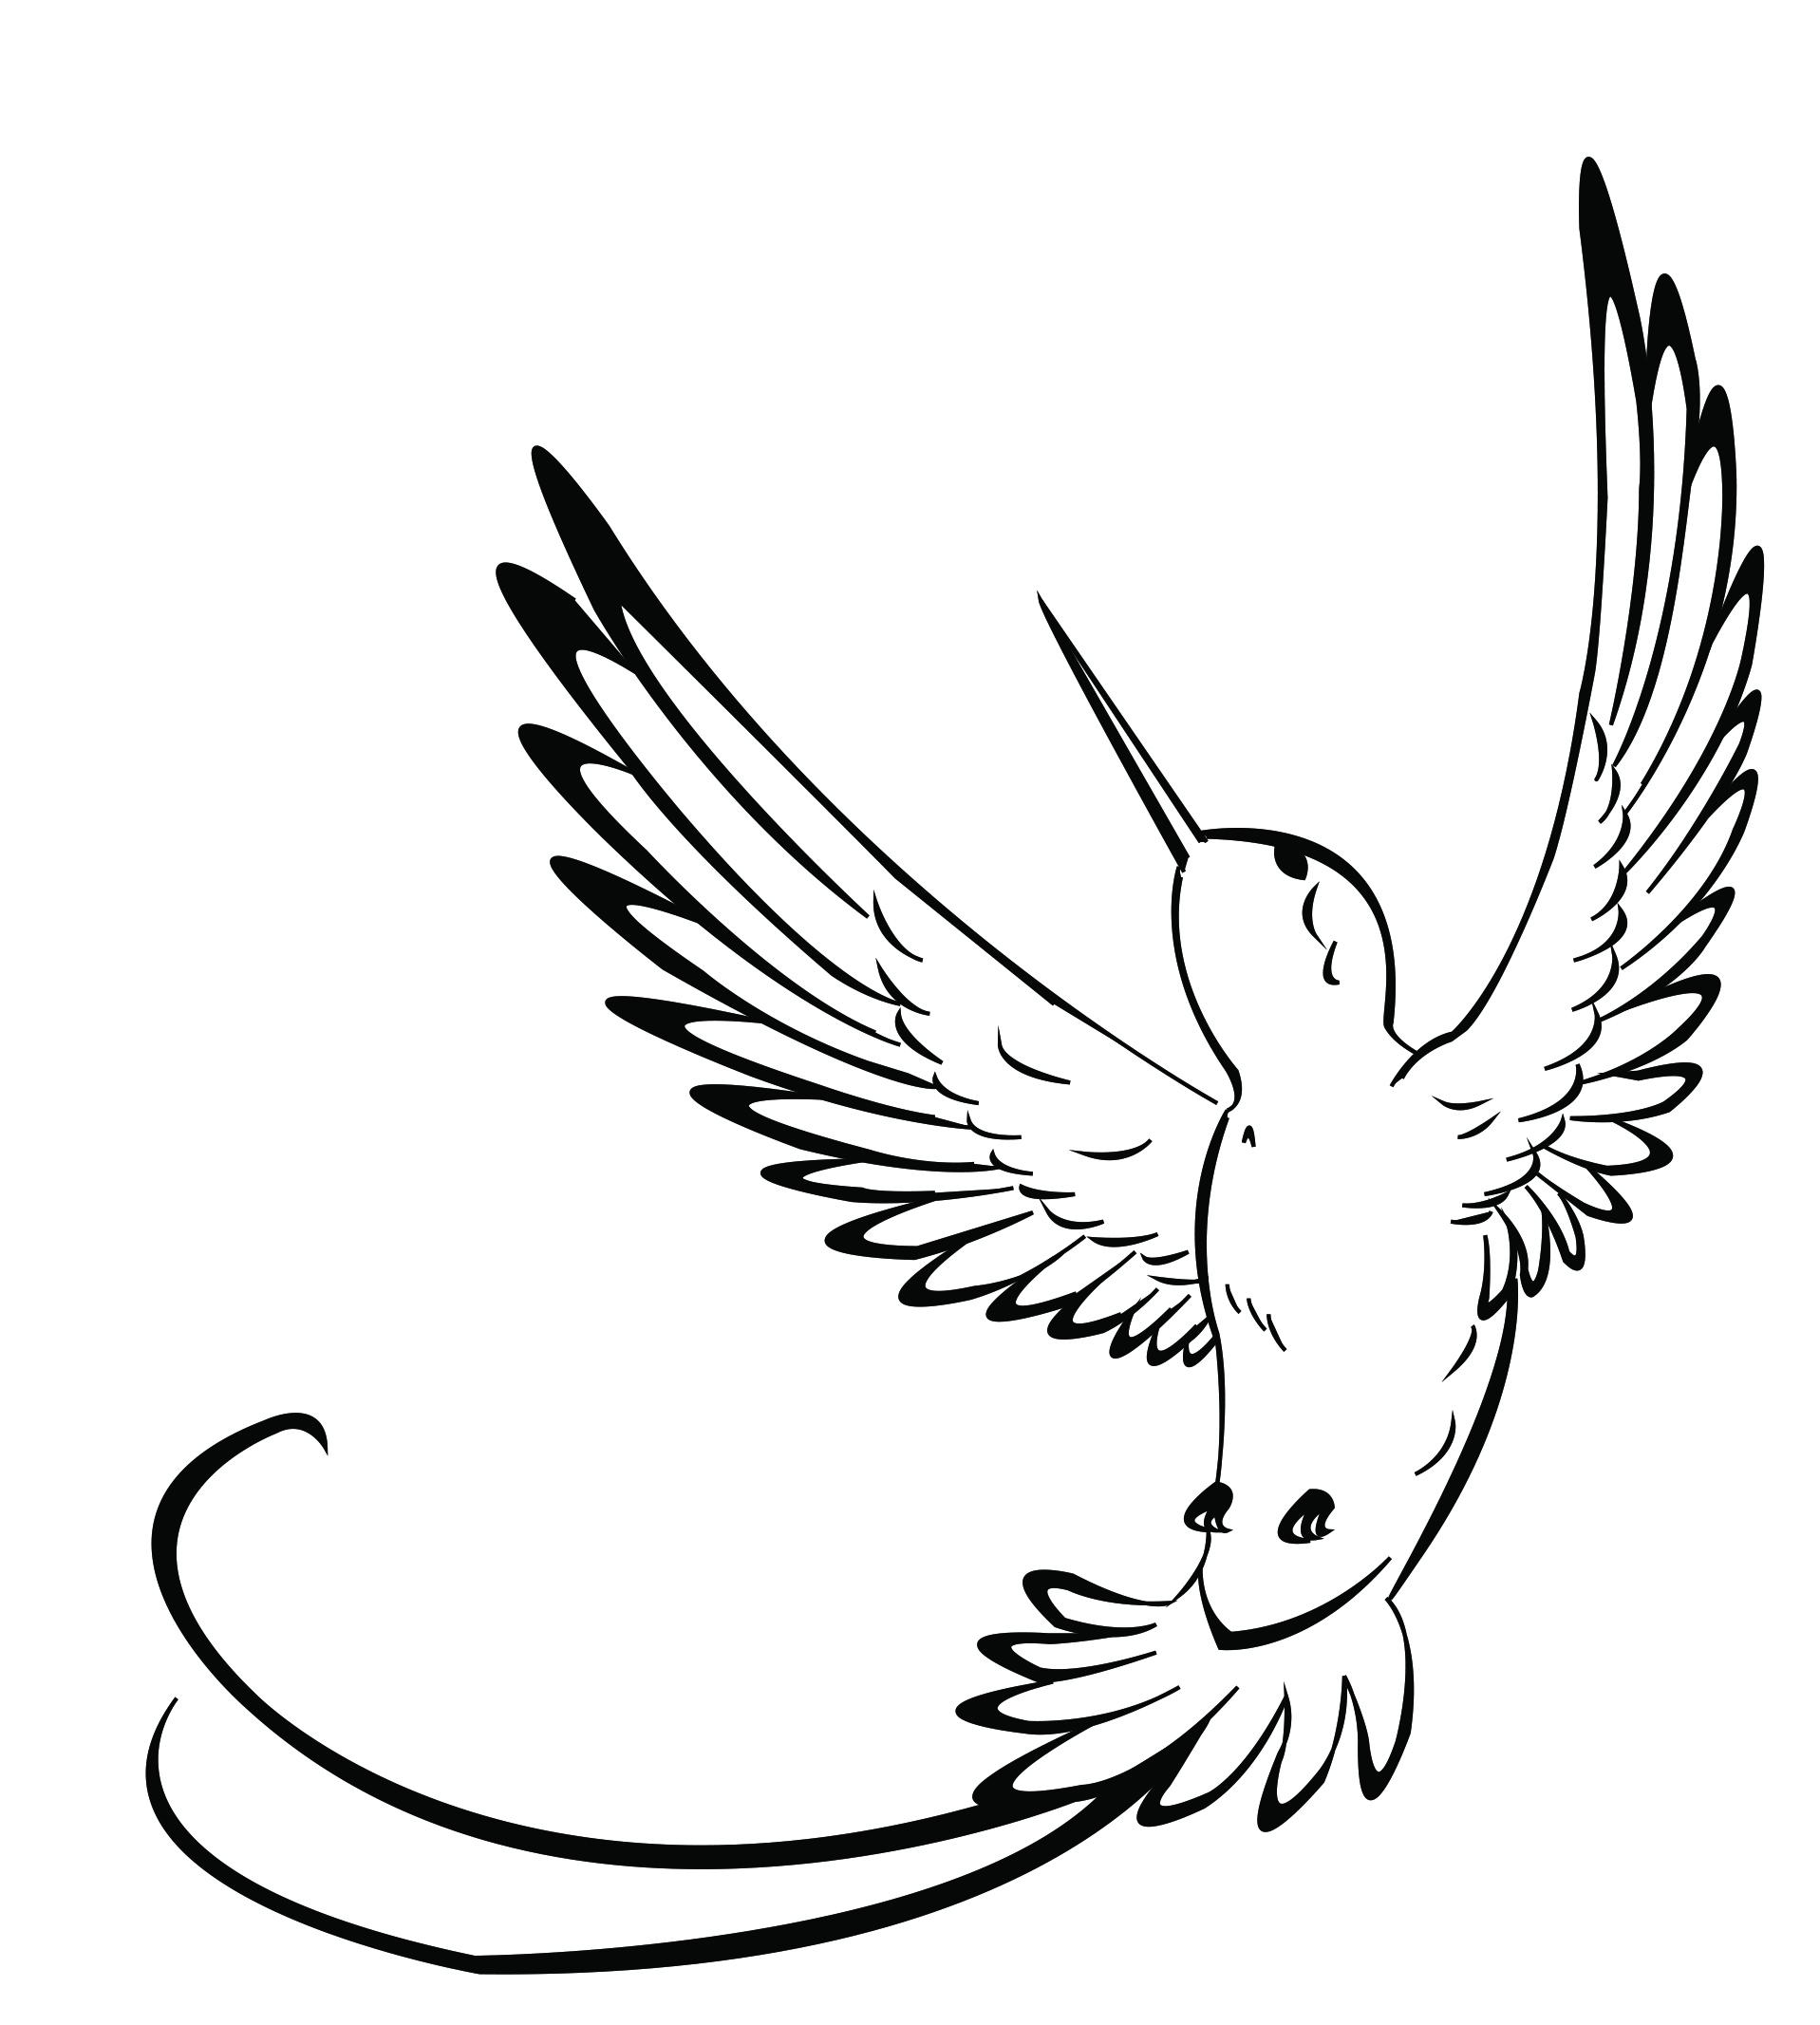 Tattoo Line Drawing At Getdrawings